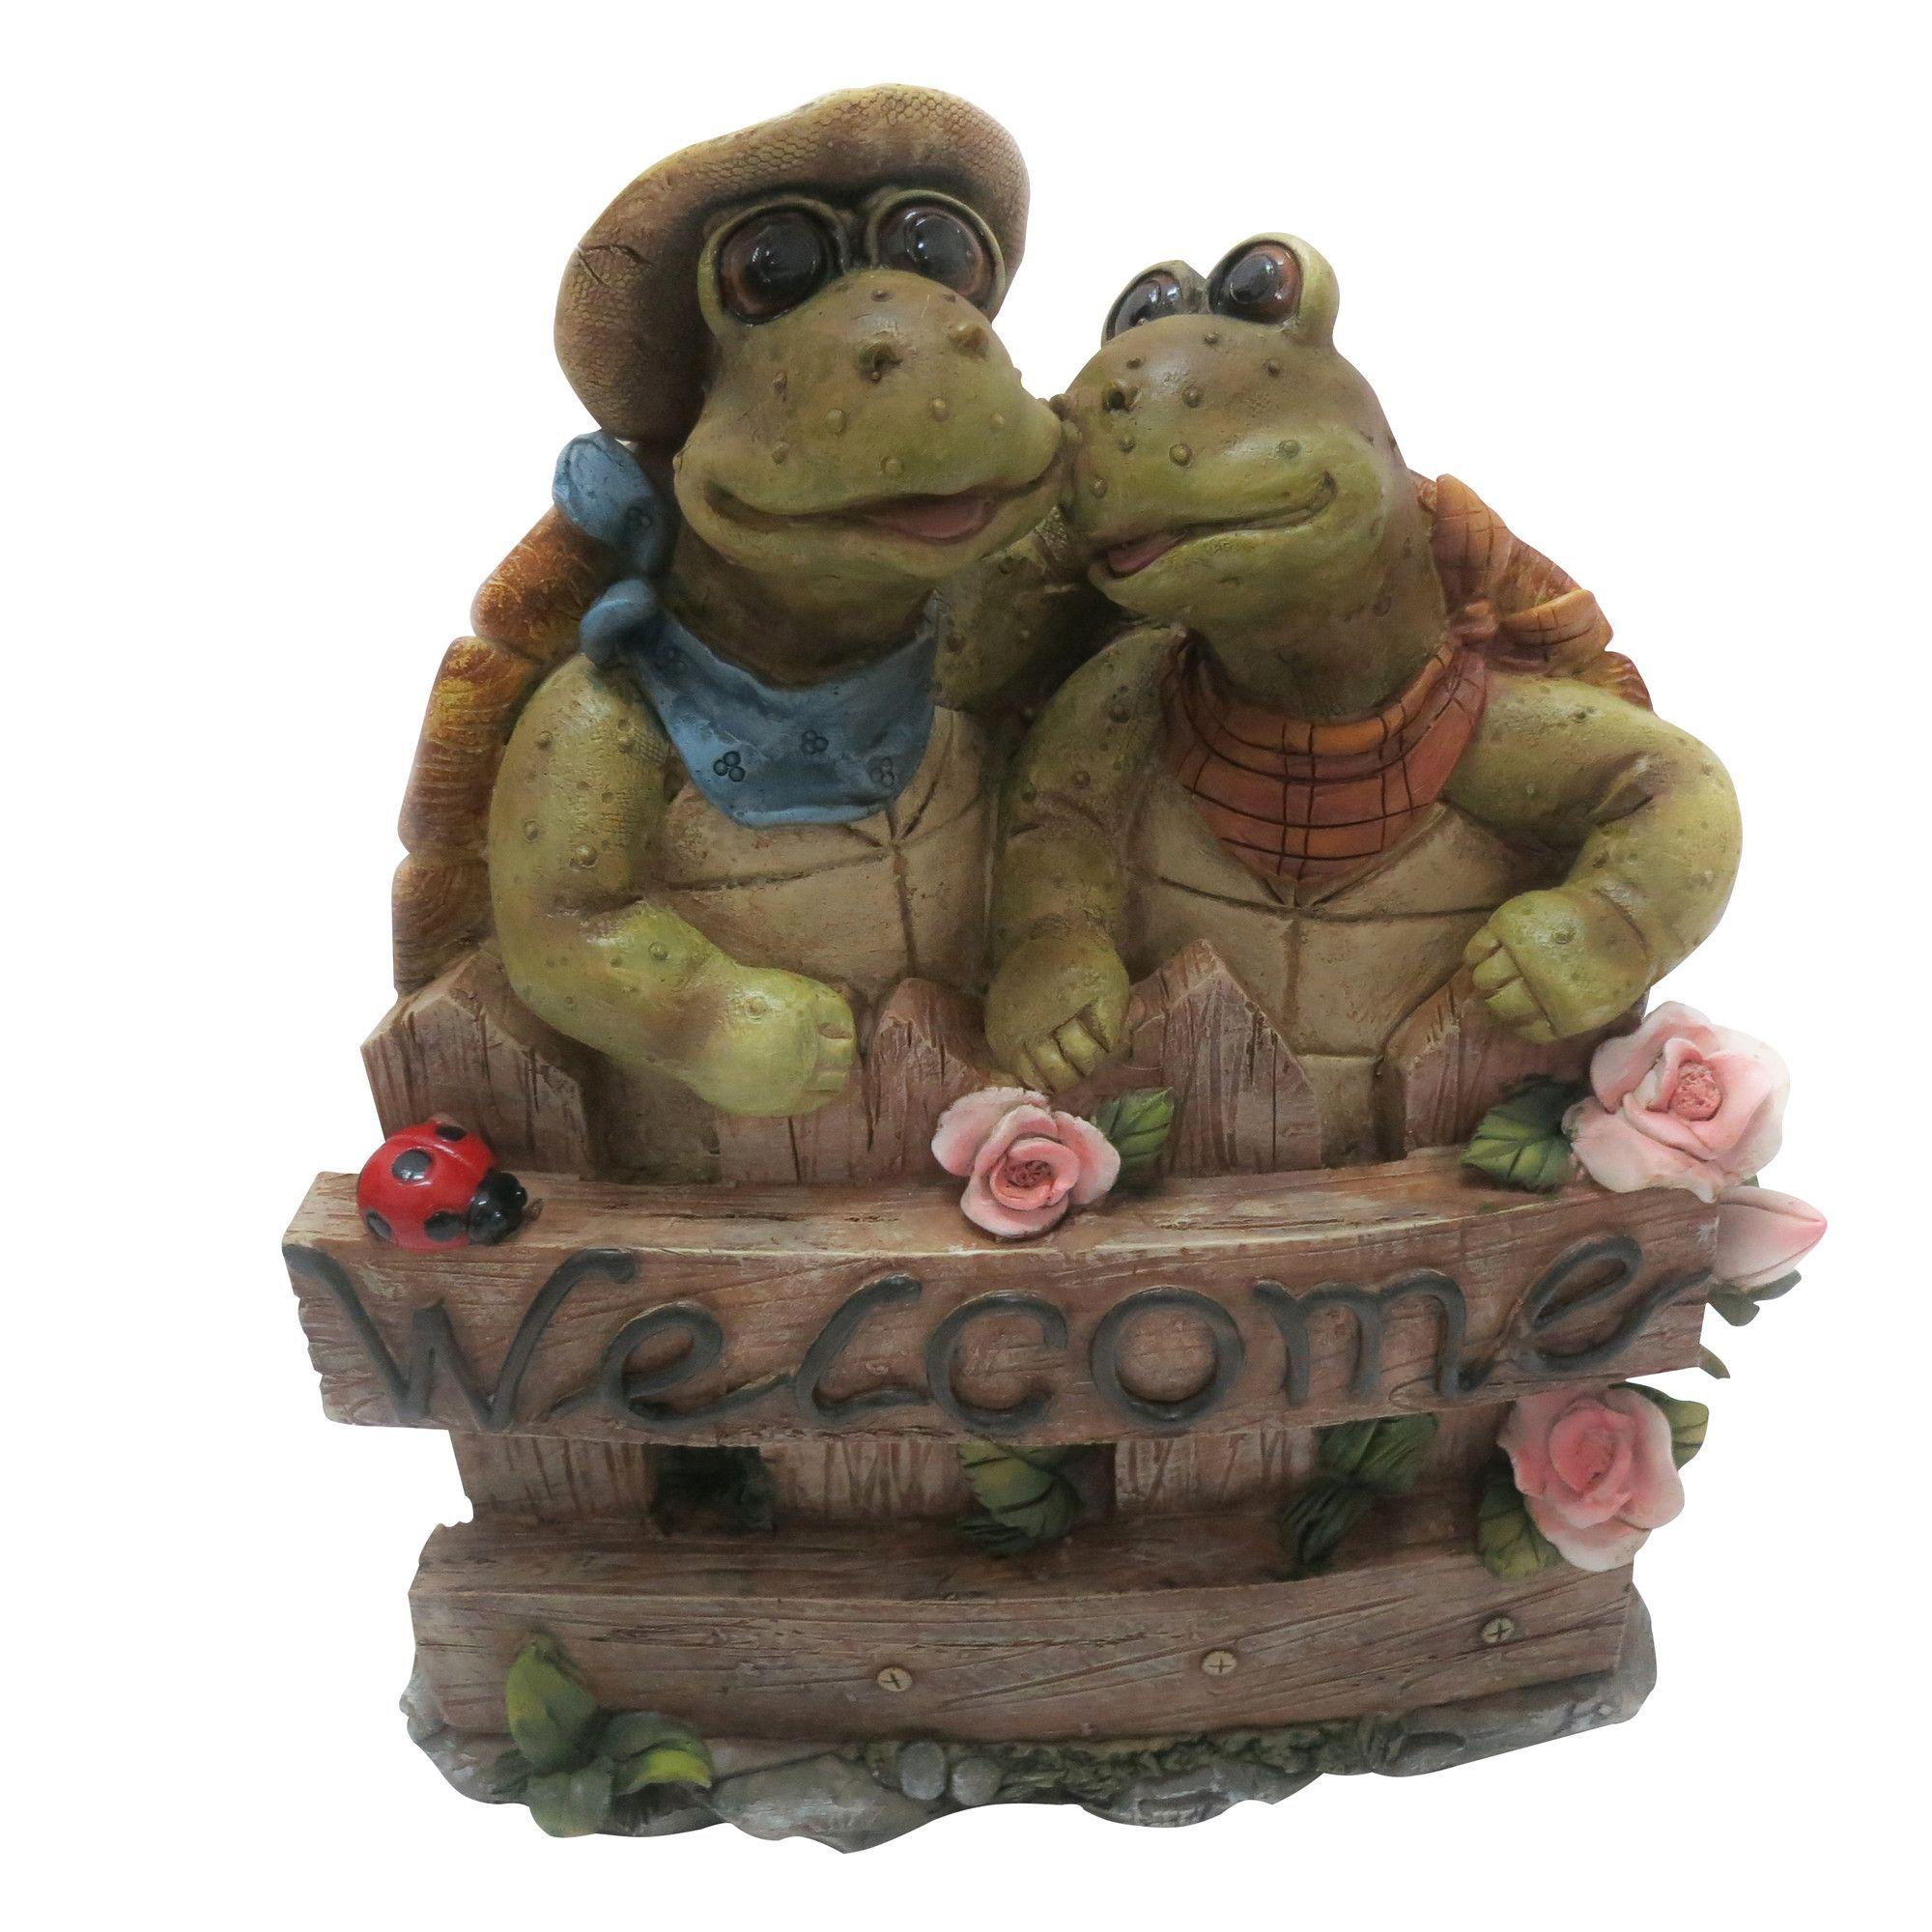 Turtle Decoration Statue | Garden | Pinterest | Turtle decorations ...